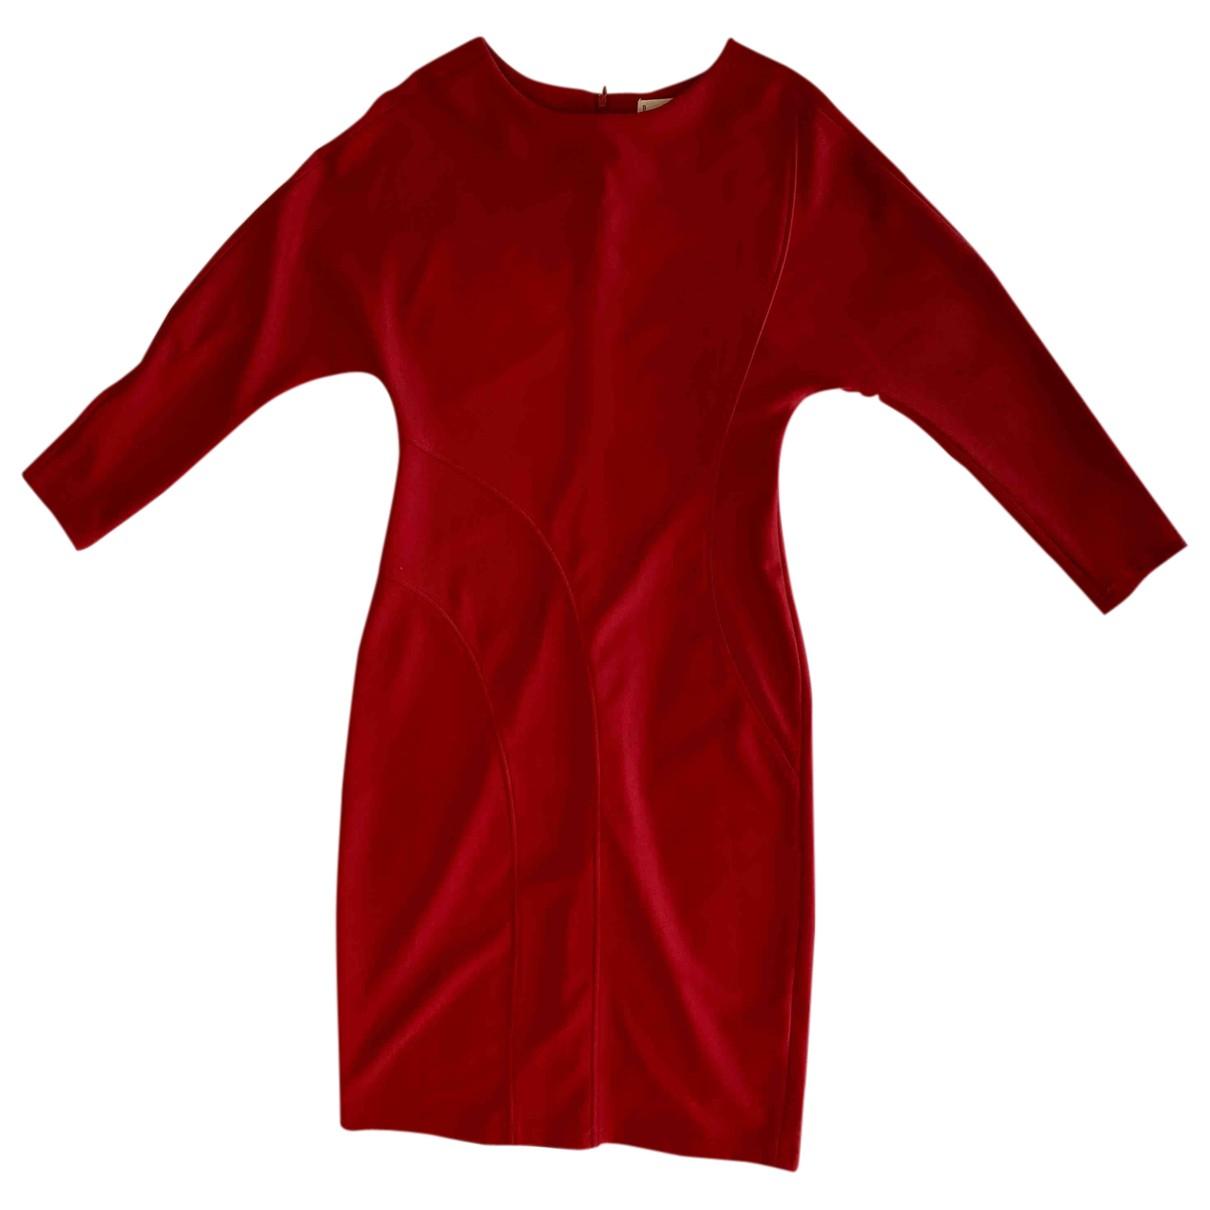 Adolfo Dominguez \N Kleid in  Bordeauxrot Polyester